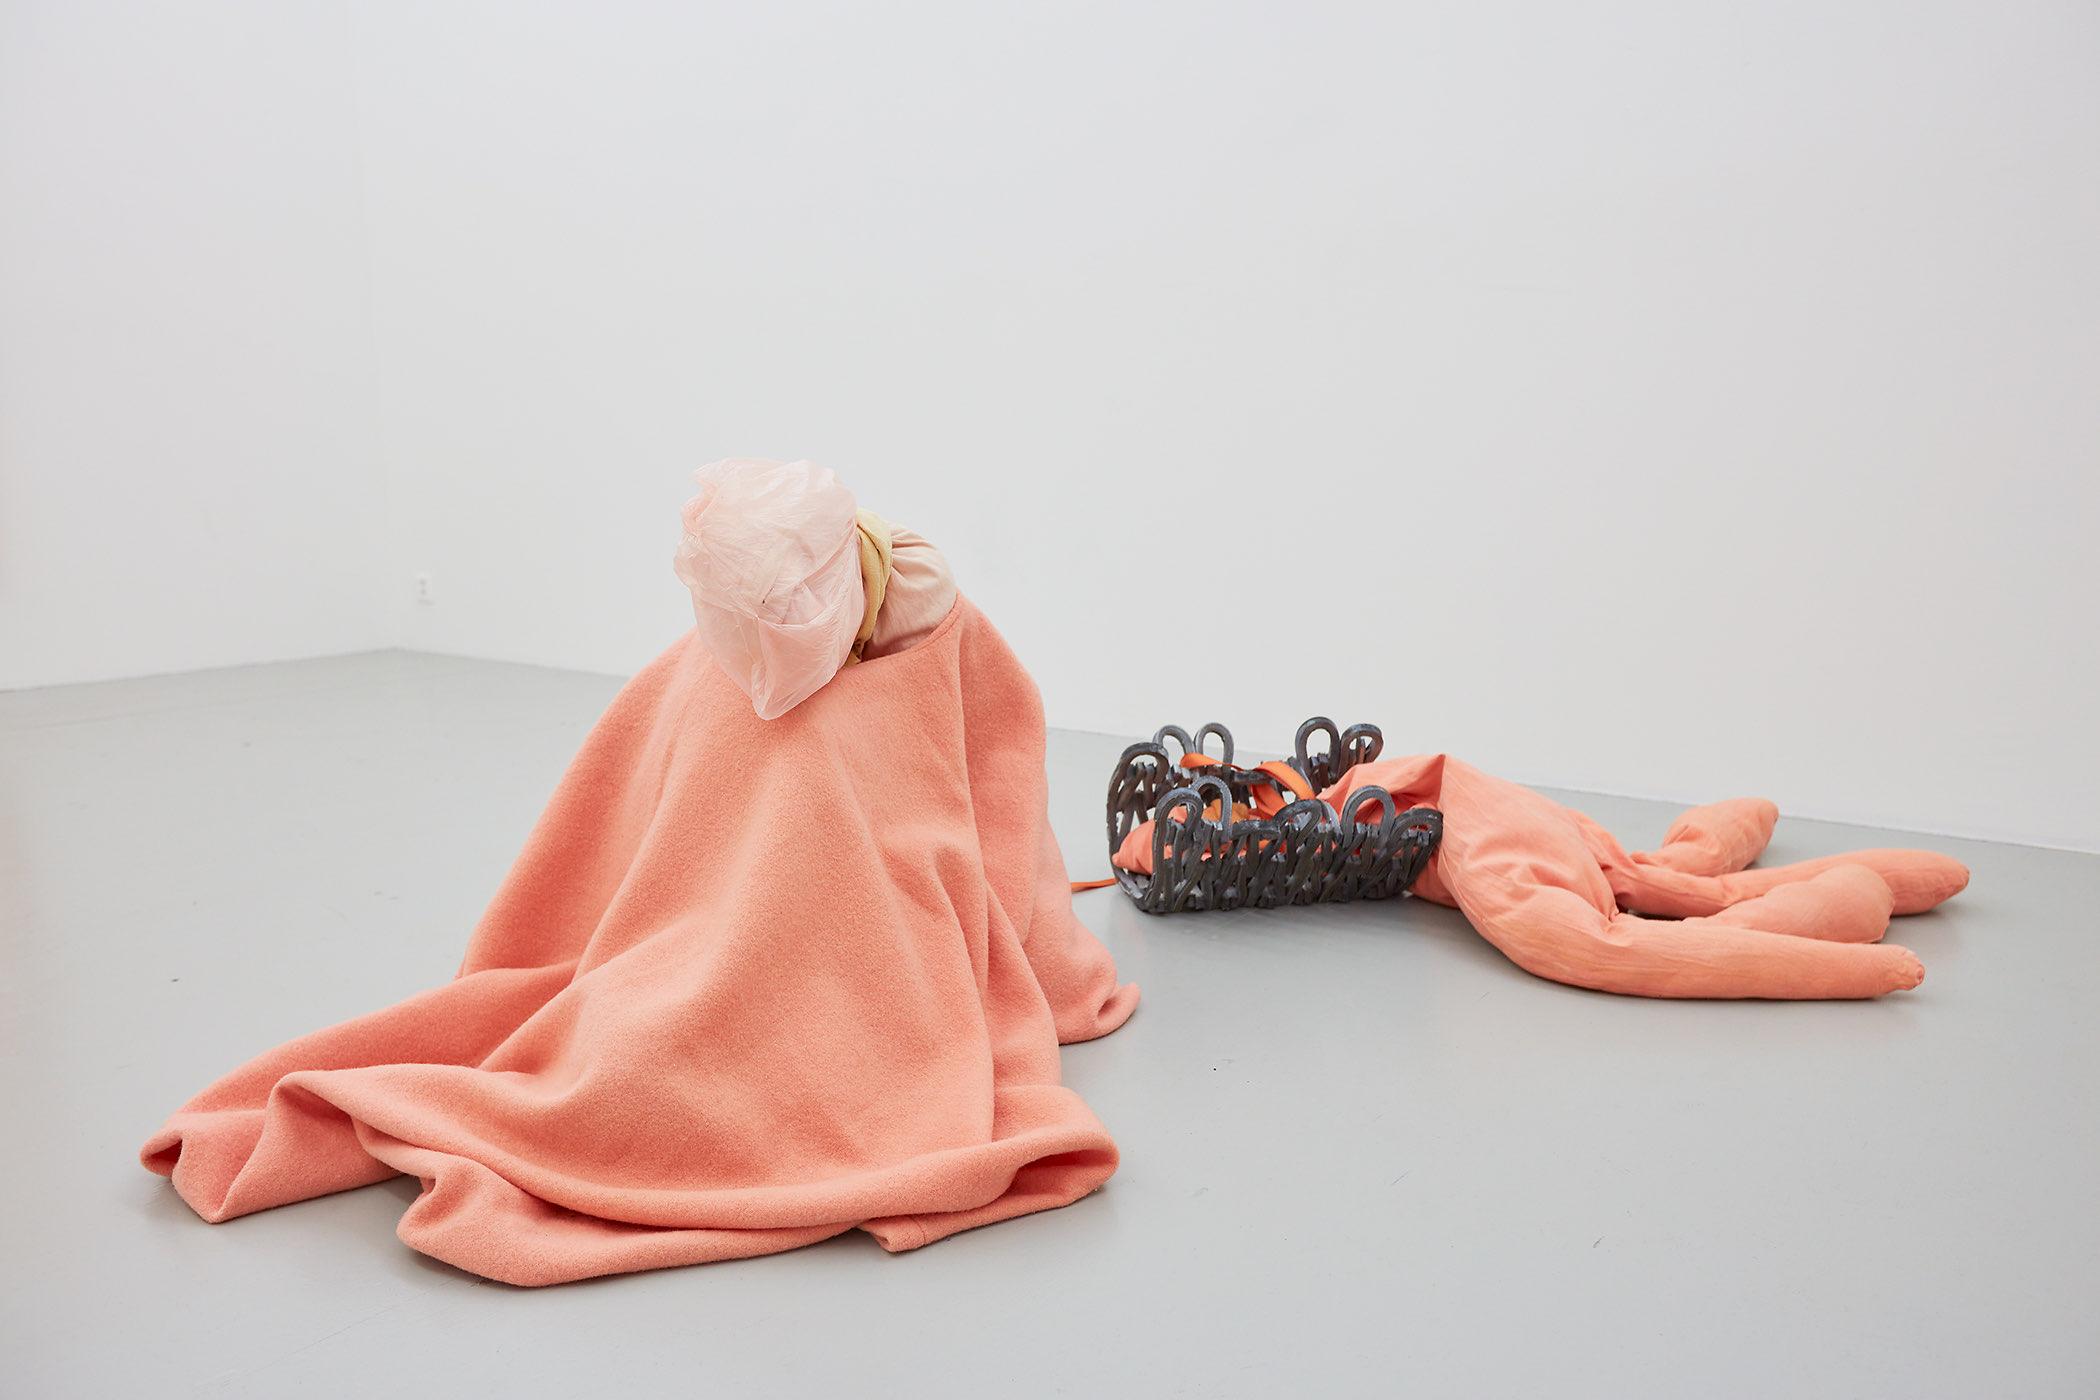 Installation Views: SALTS, Birsfelden Exhibition: TEETH & LIGHTNING Megan Rooney Curated by Samuel Leuenberger Exhibition. Installation shots: Moritz Schermbach Photography Courtesy: SALTS & the Artist